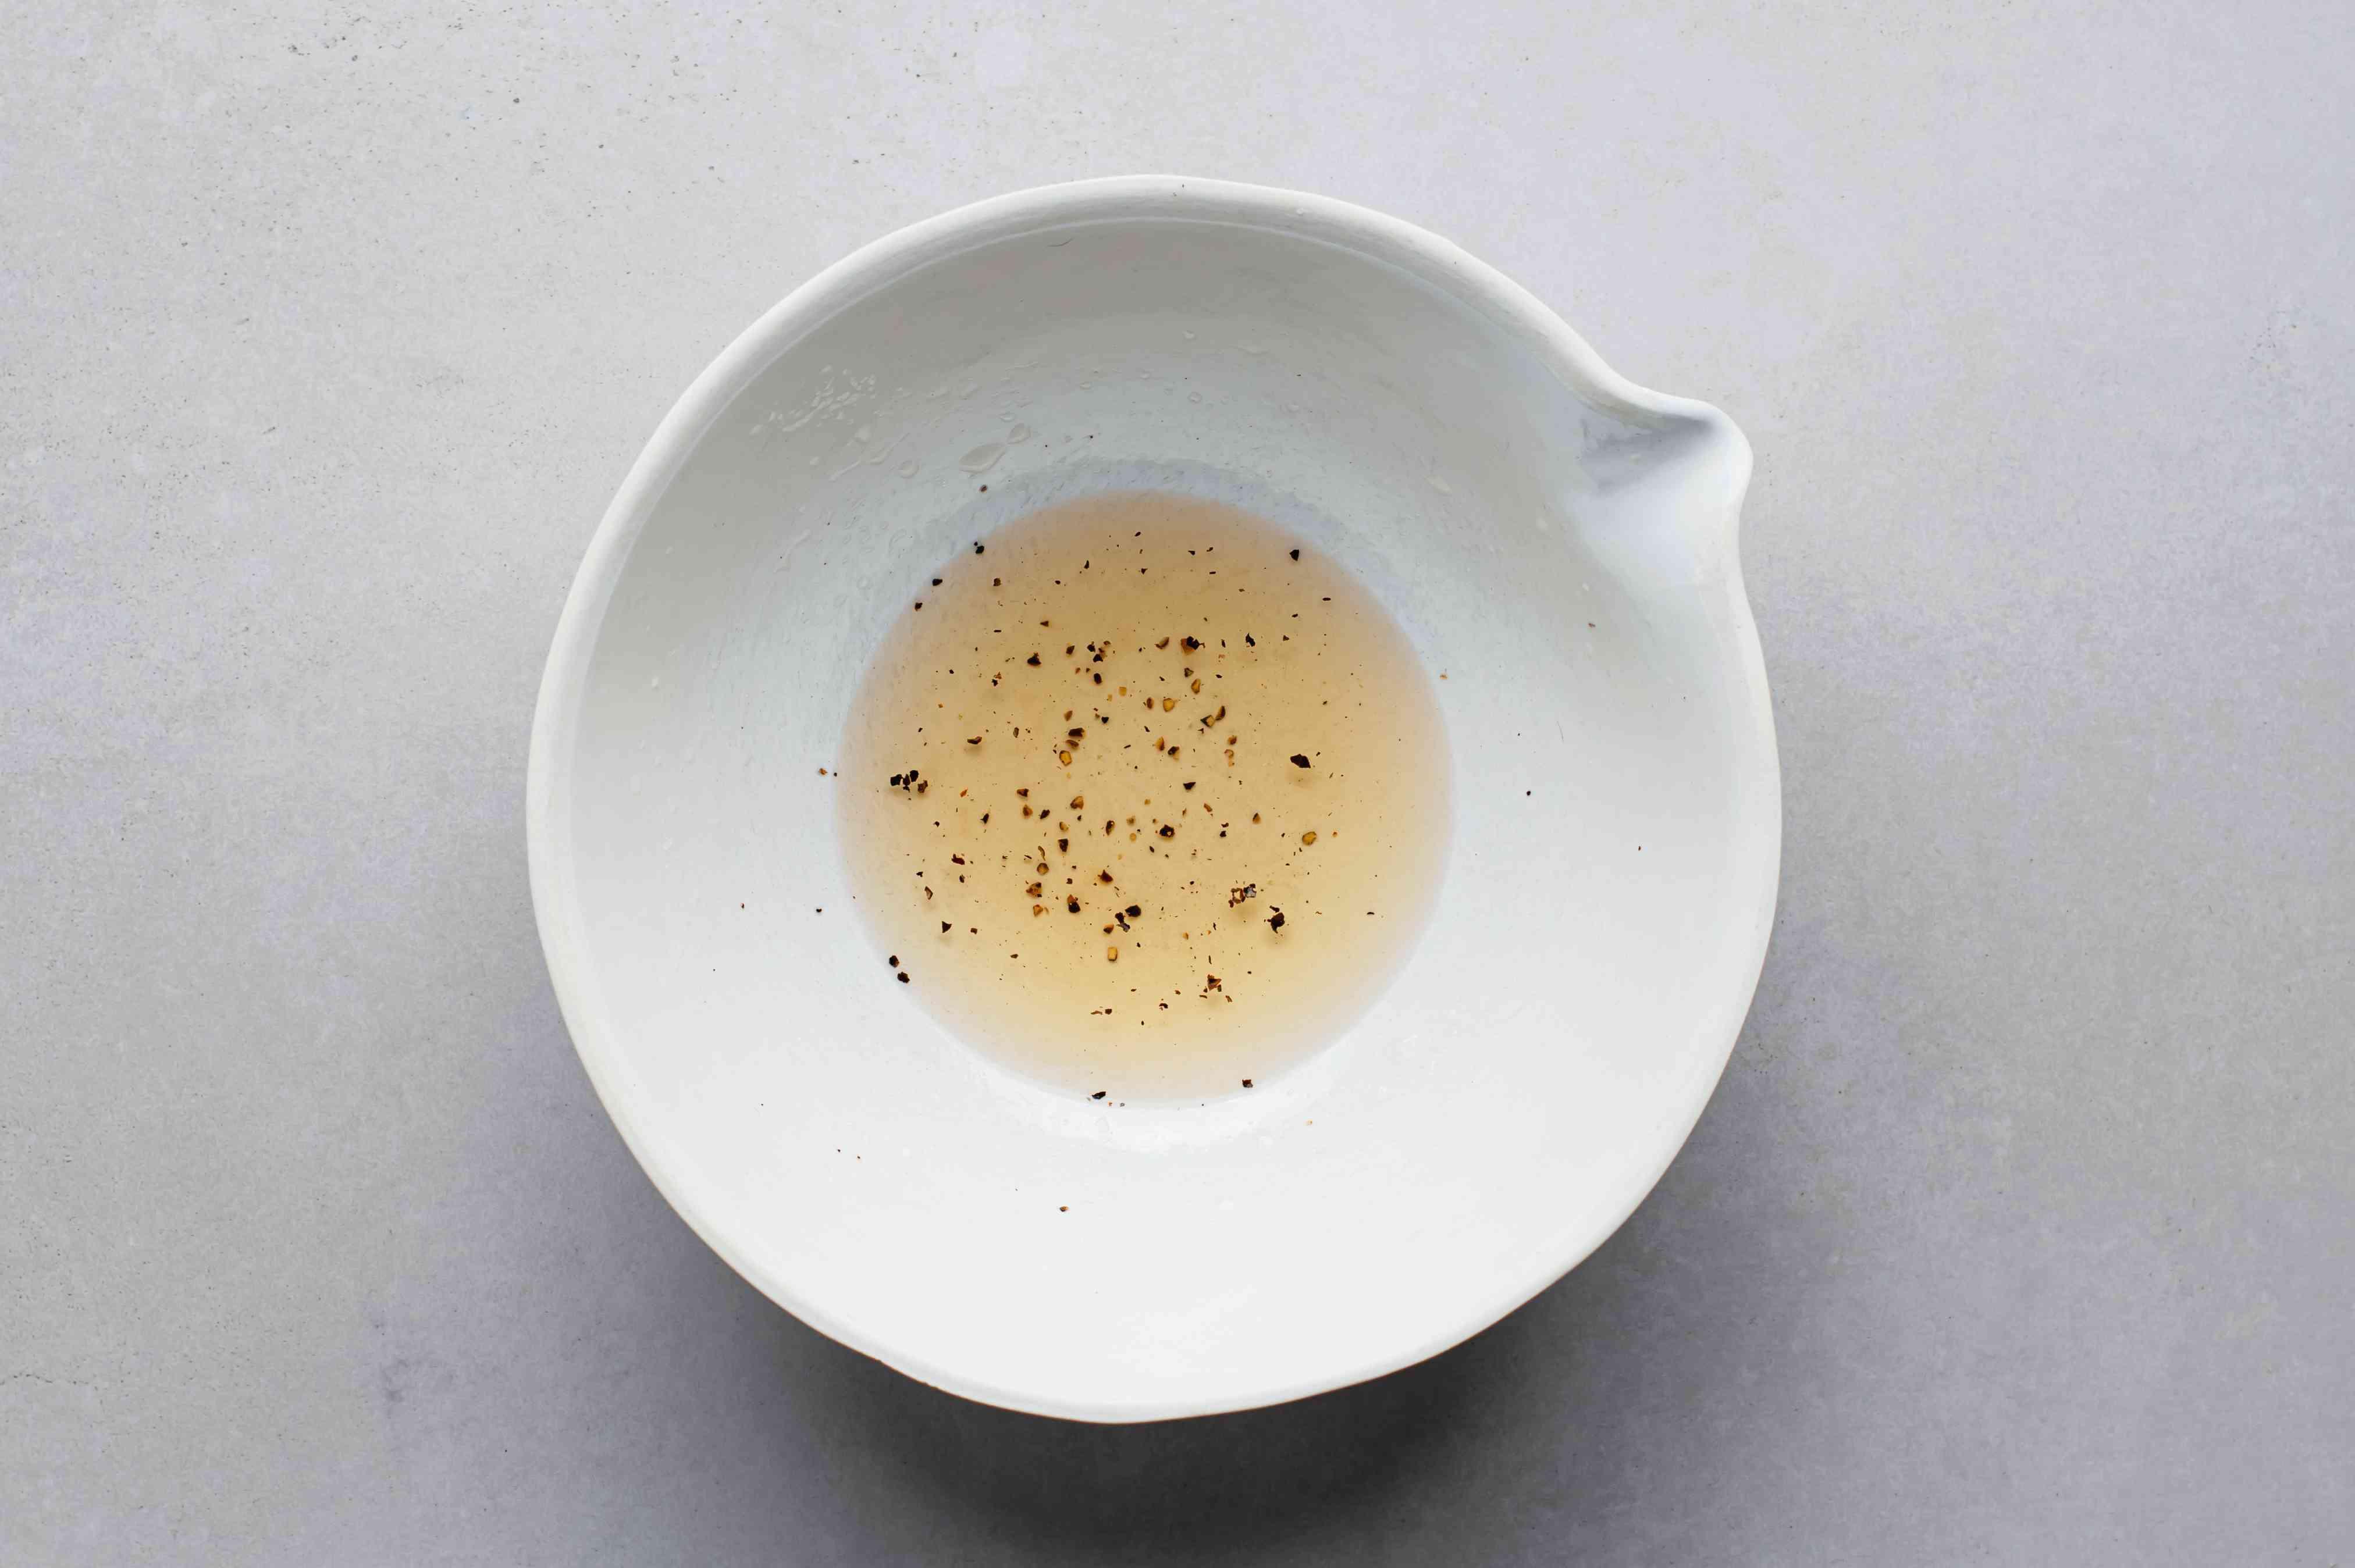 Vinegar, sugar, salt, and pepper in a serving bowl